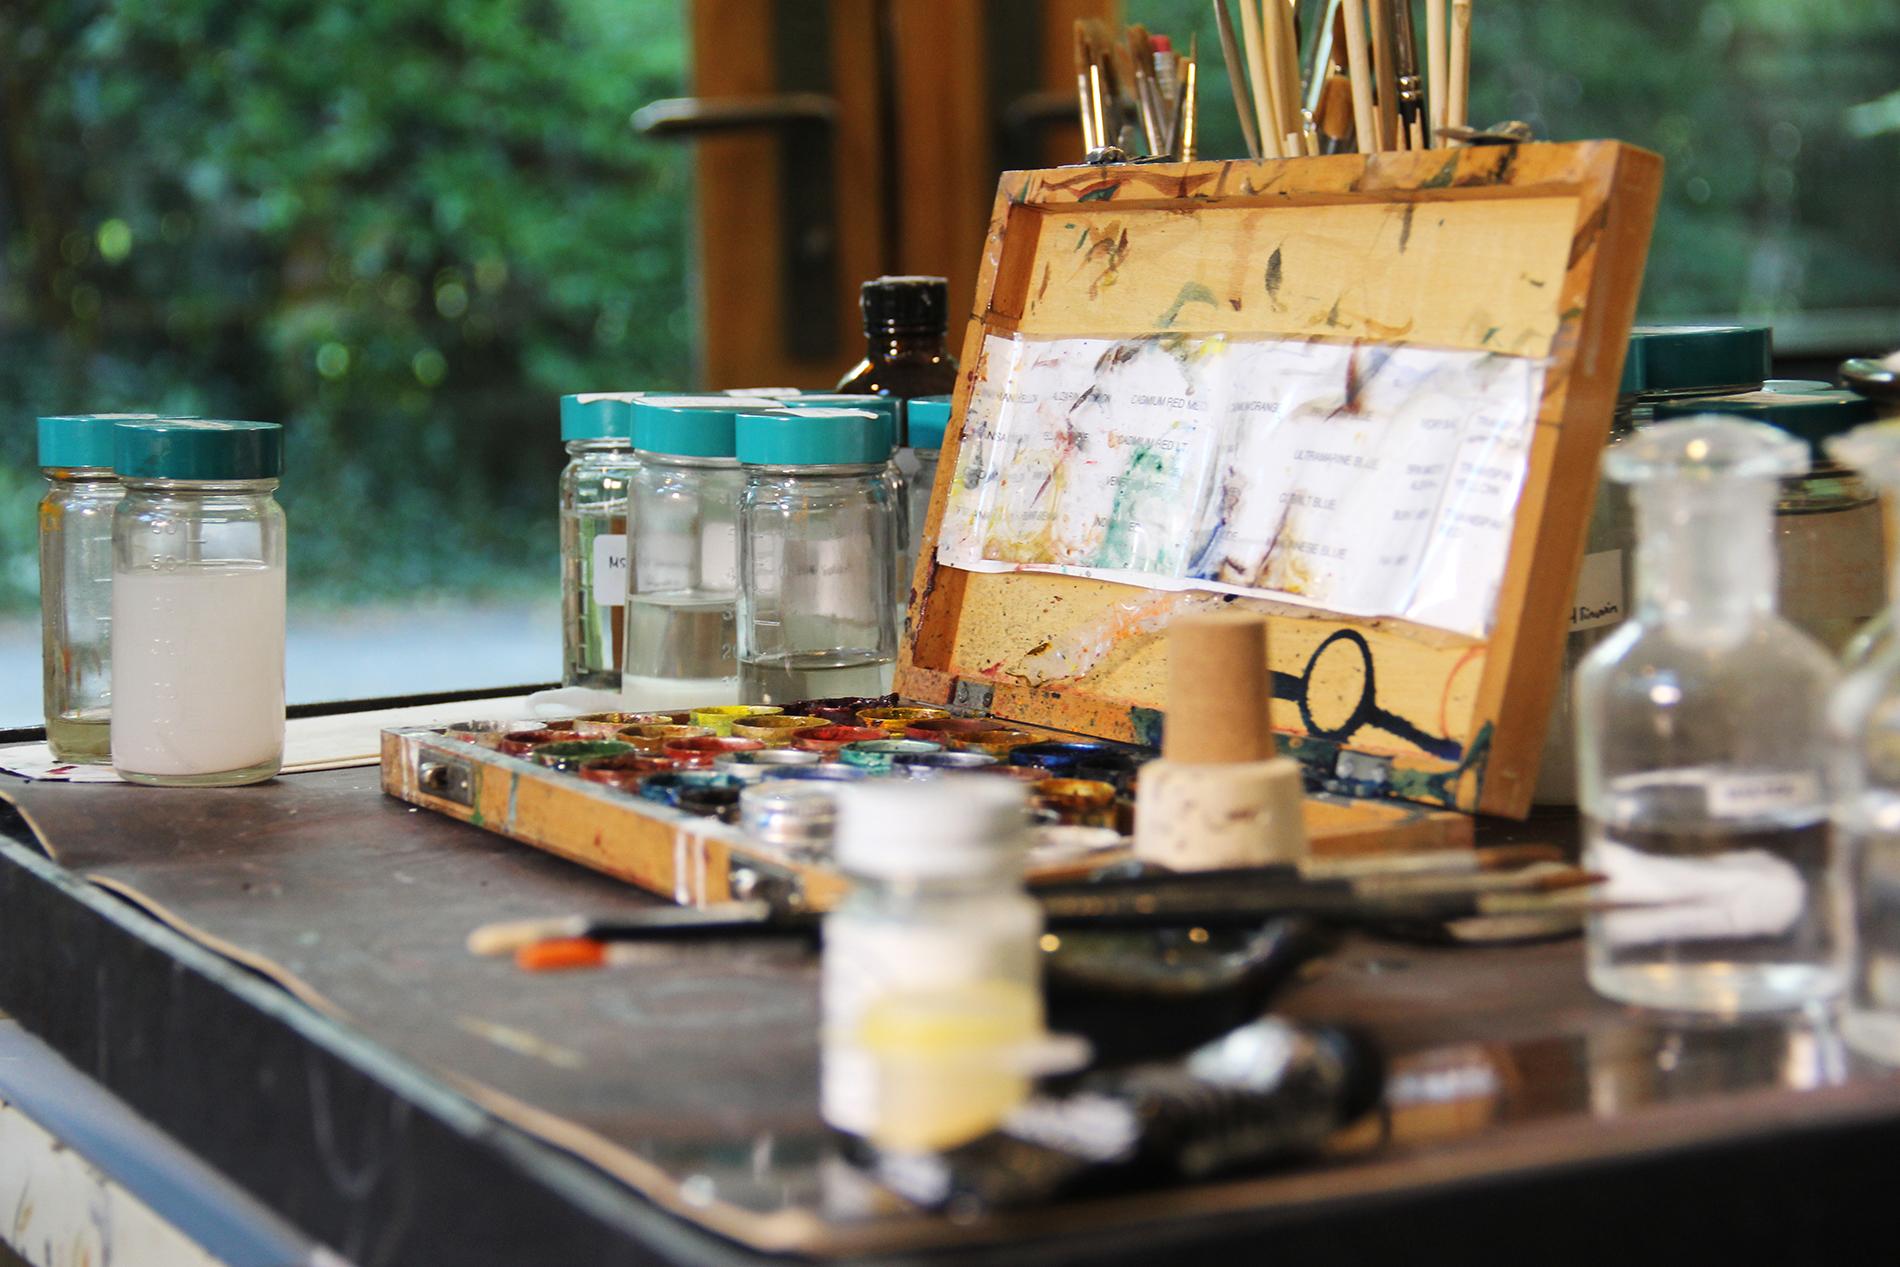 a painter's palette sits on a cart